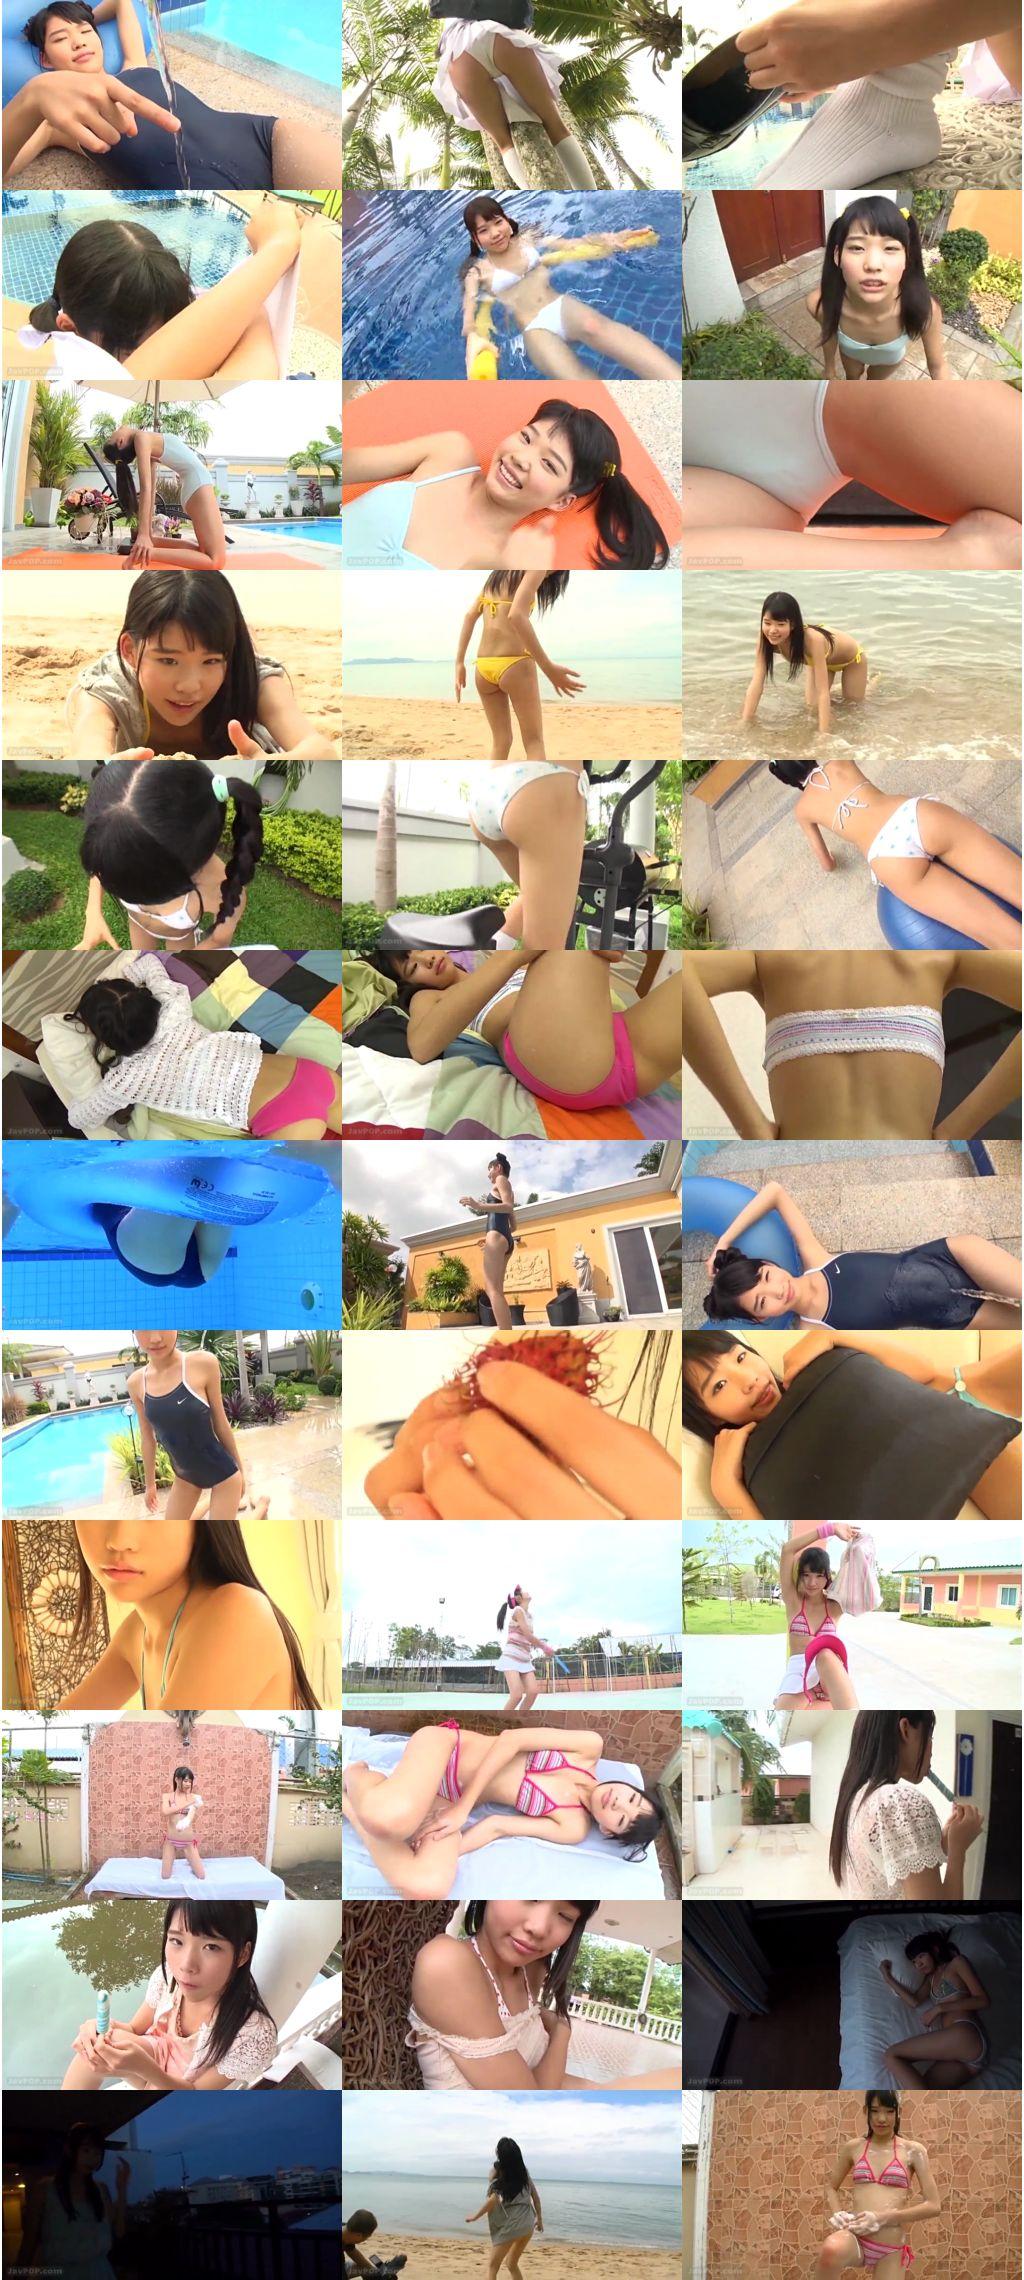 tsdv 41605 s - [TSDV-41605] 相澤はな Hana Aizawa – クラスメイト